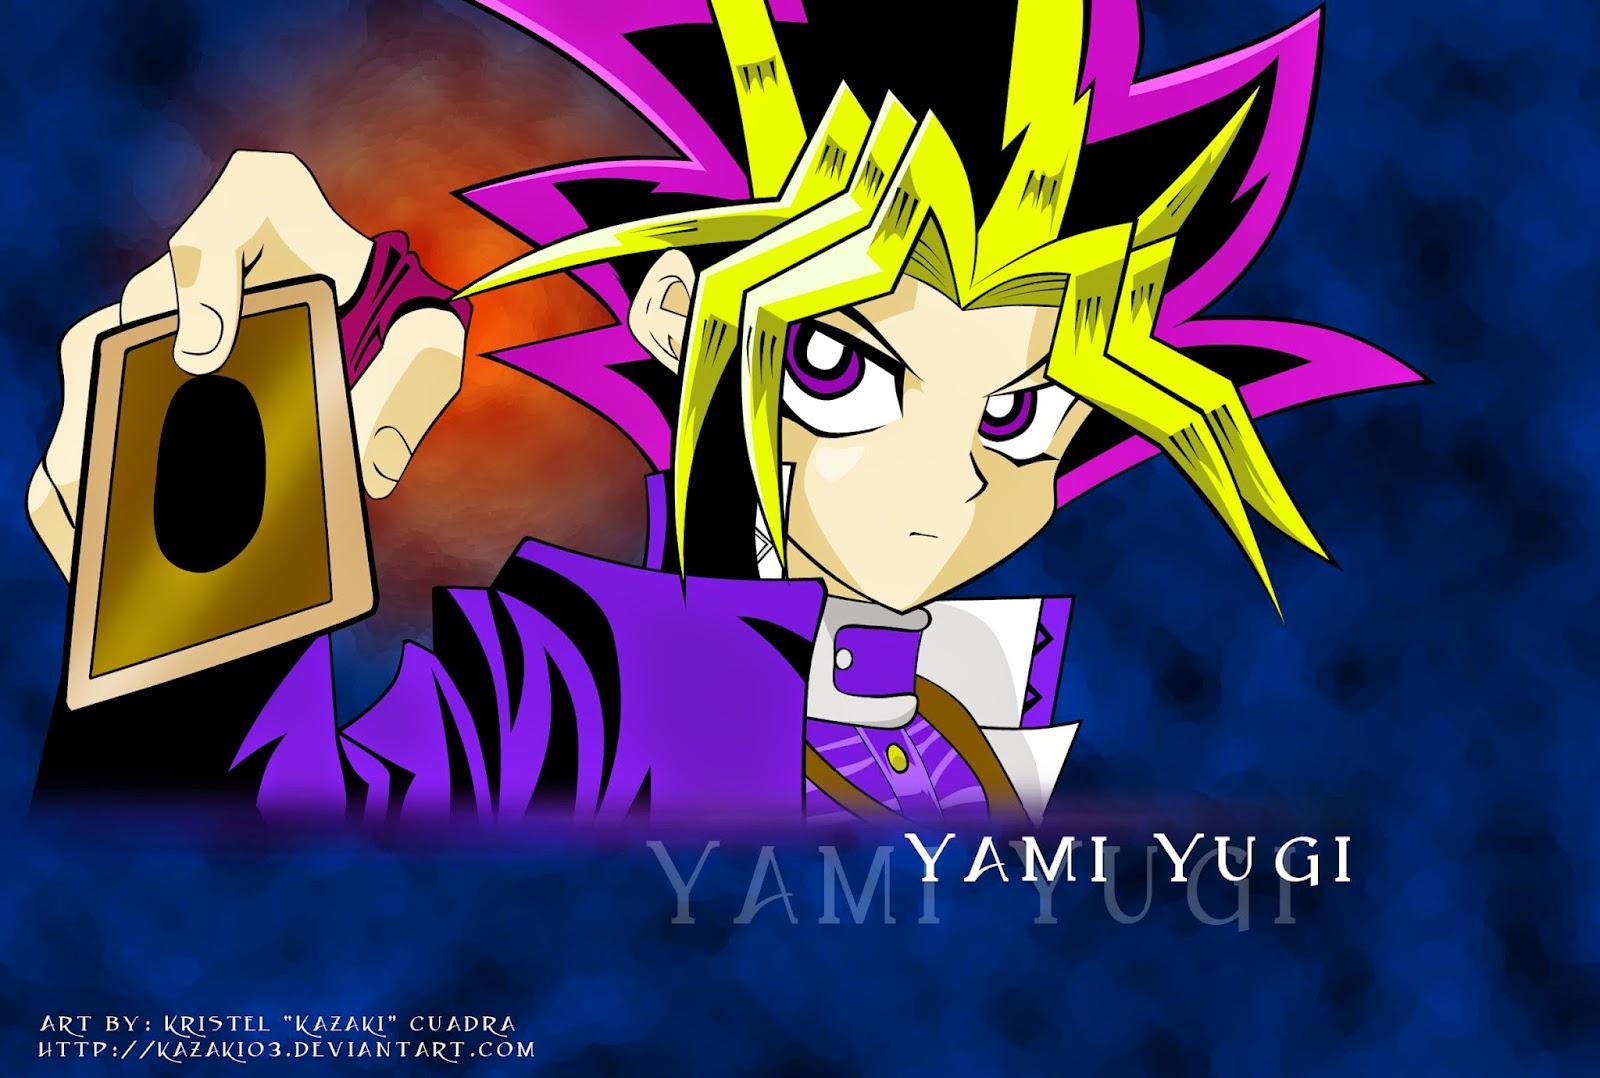 http://kazaki03.deviantart.com/art/Yami-Yugi-110607790